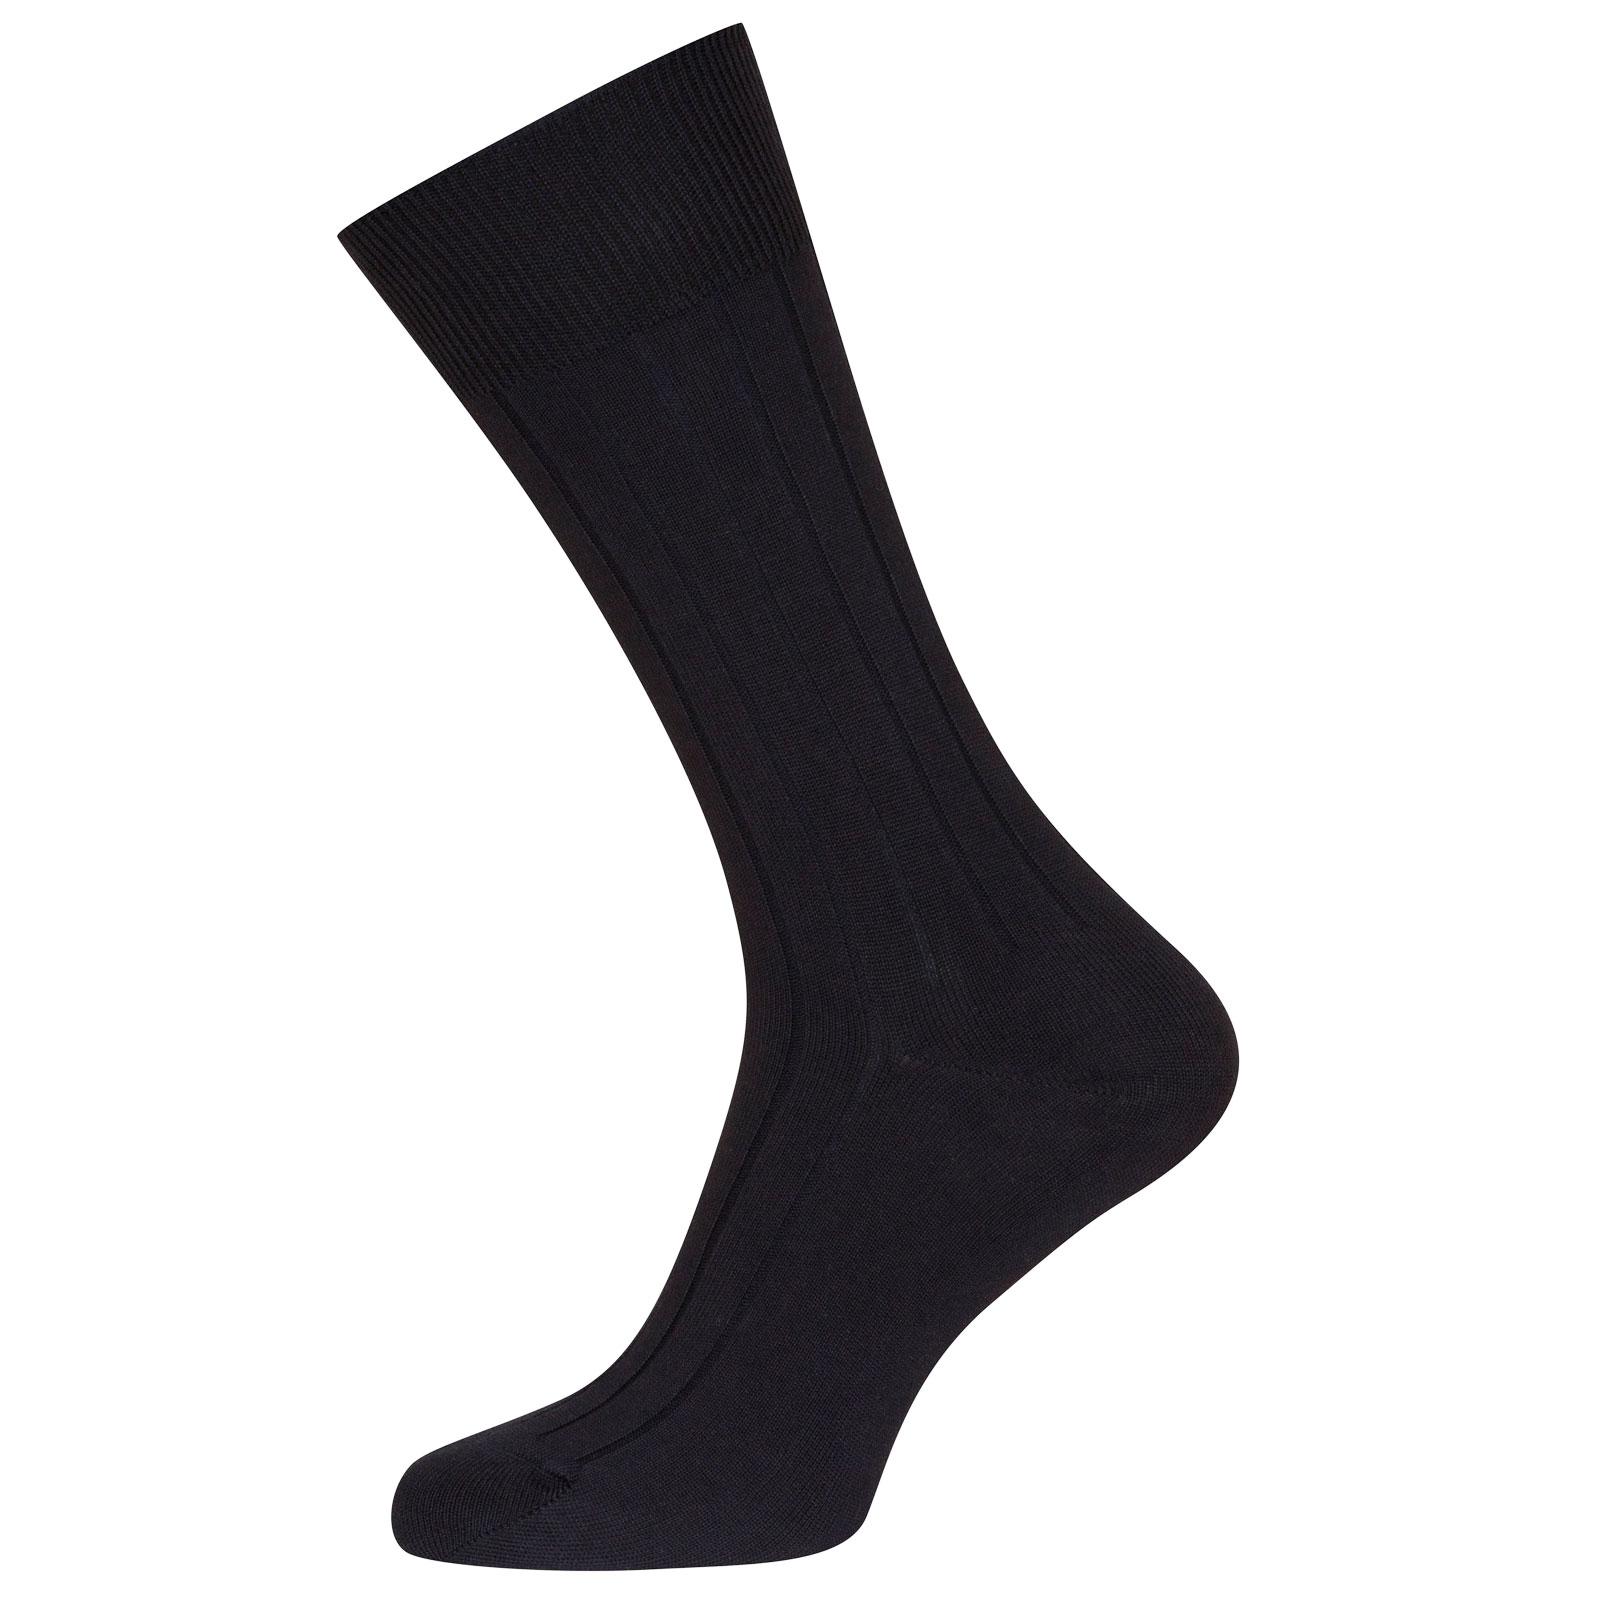 John Smedley Delta Sea Island Cotton Socks in Navy-S/M